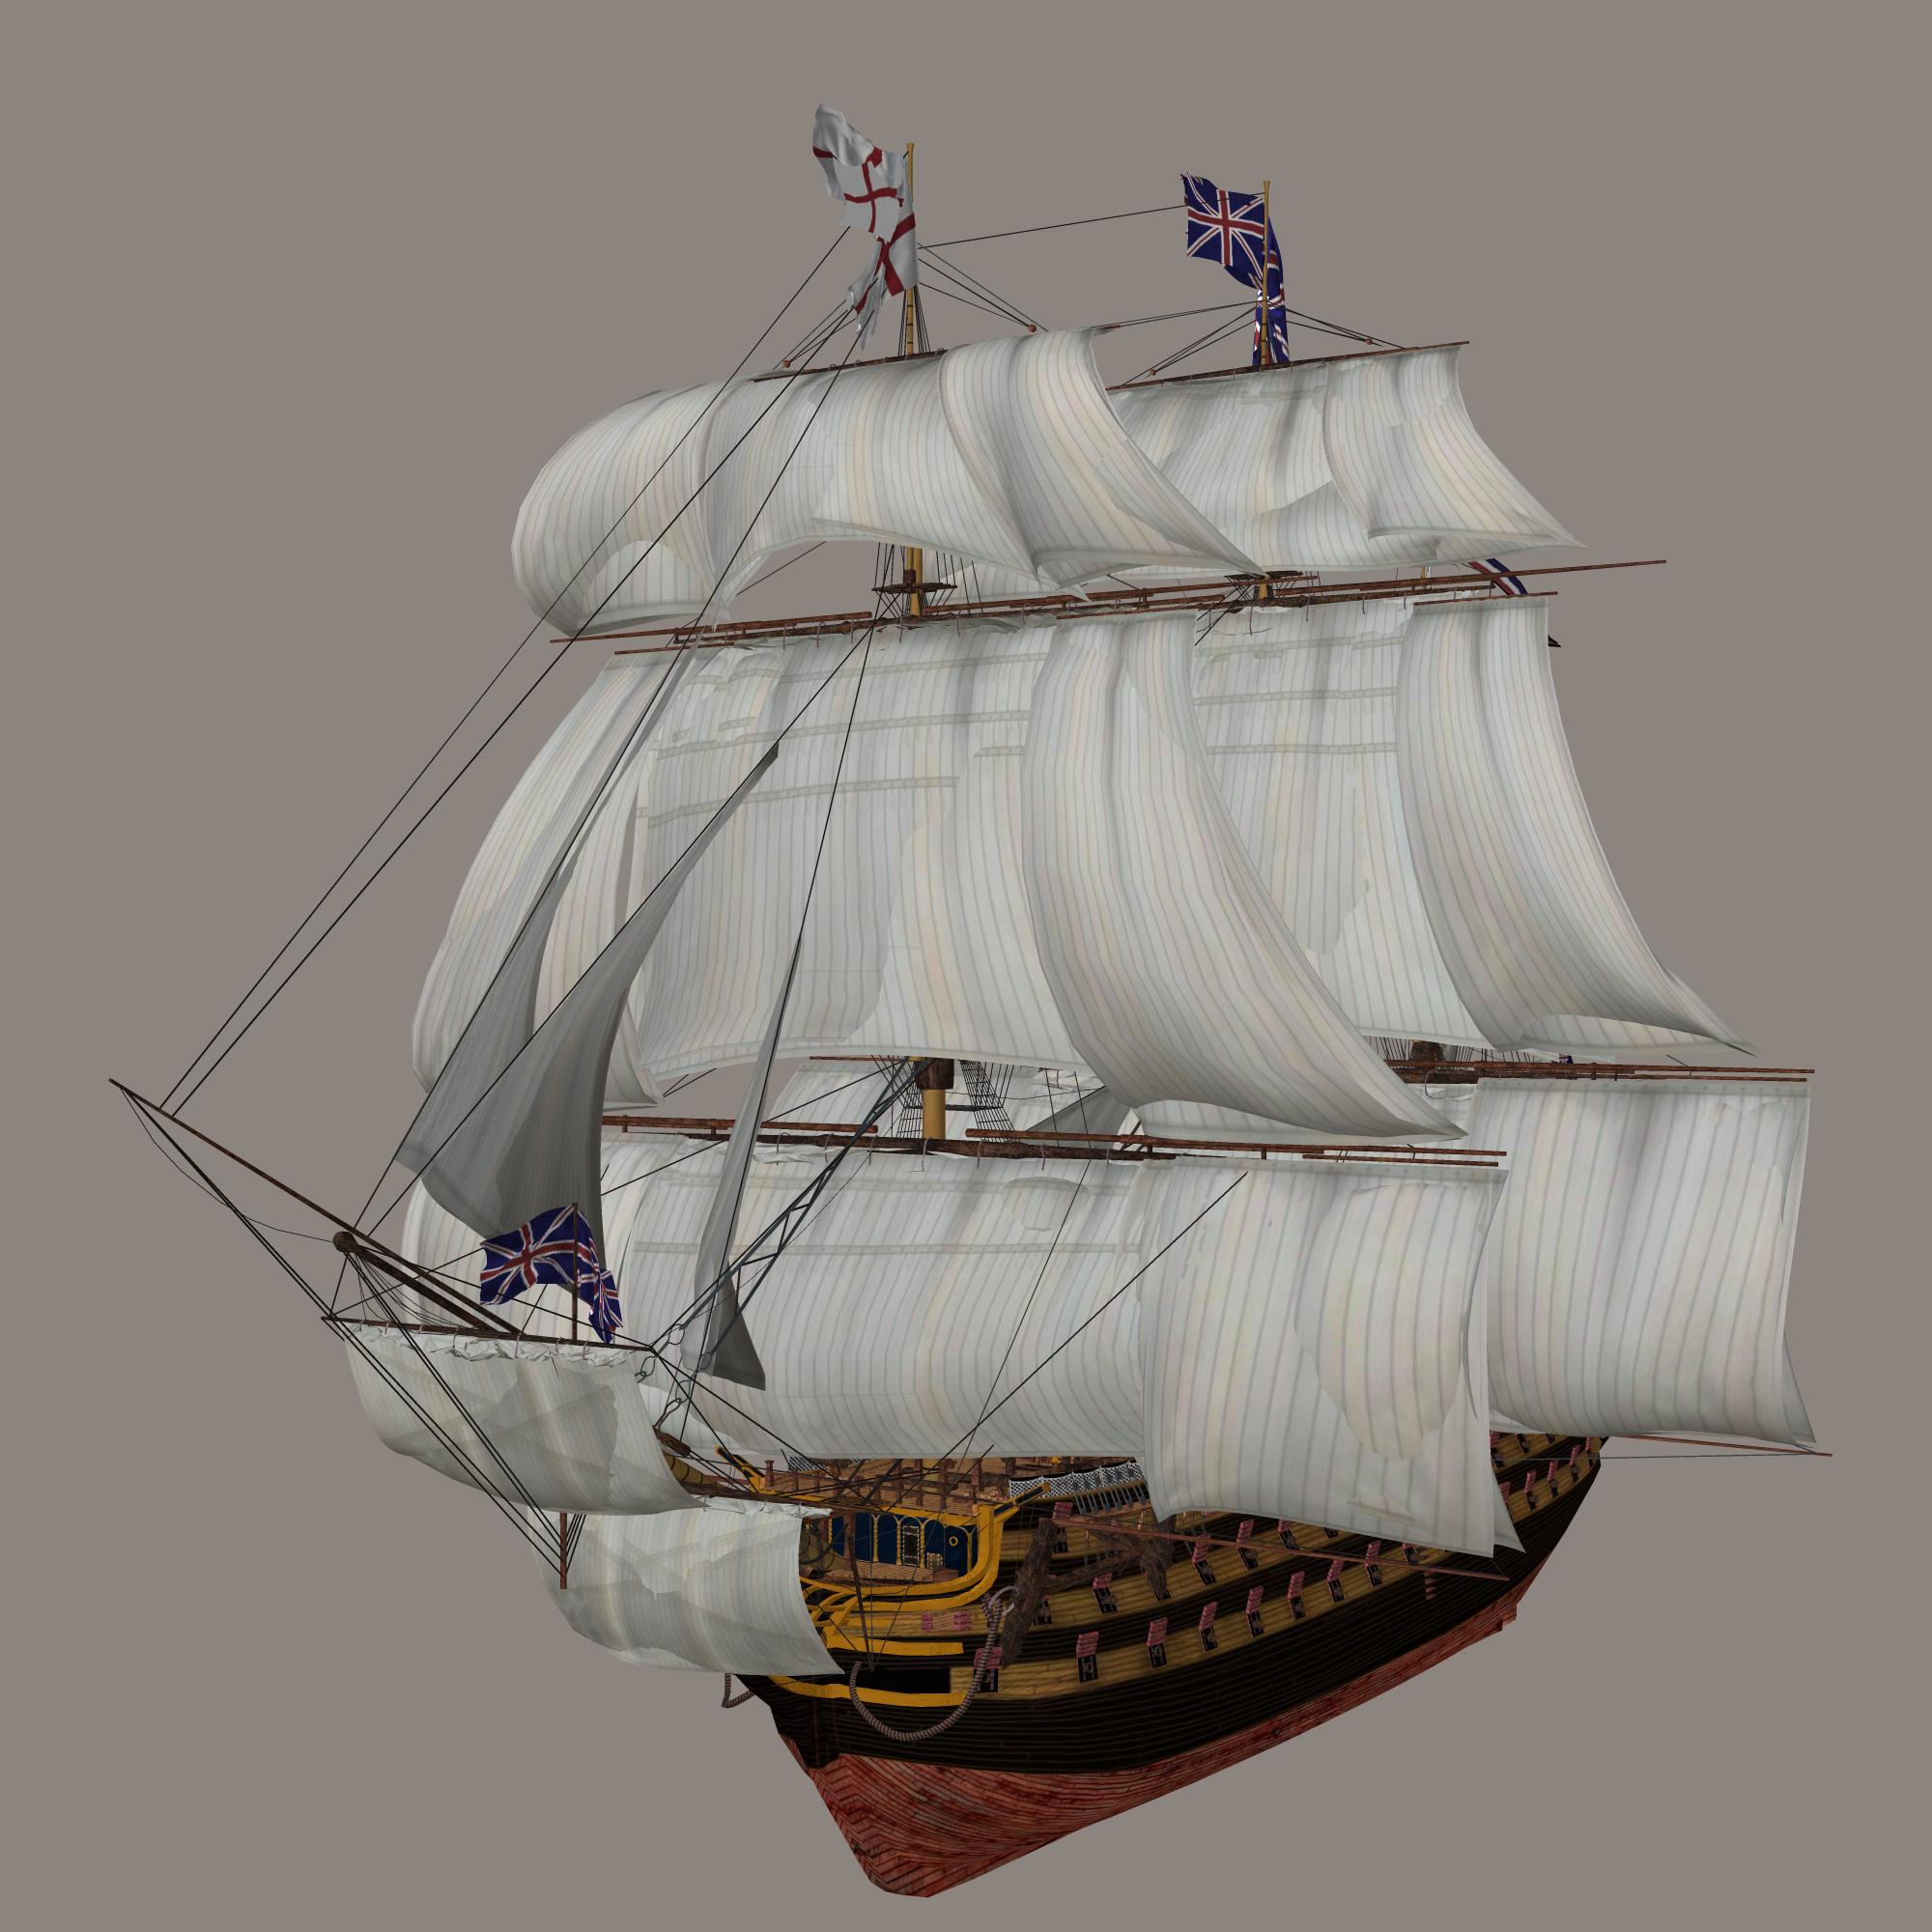 Big Ship PNG Image